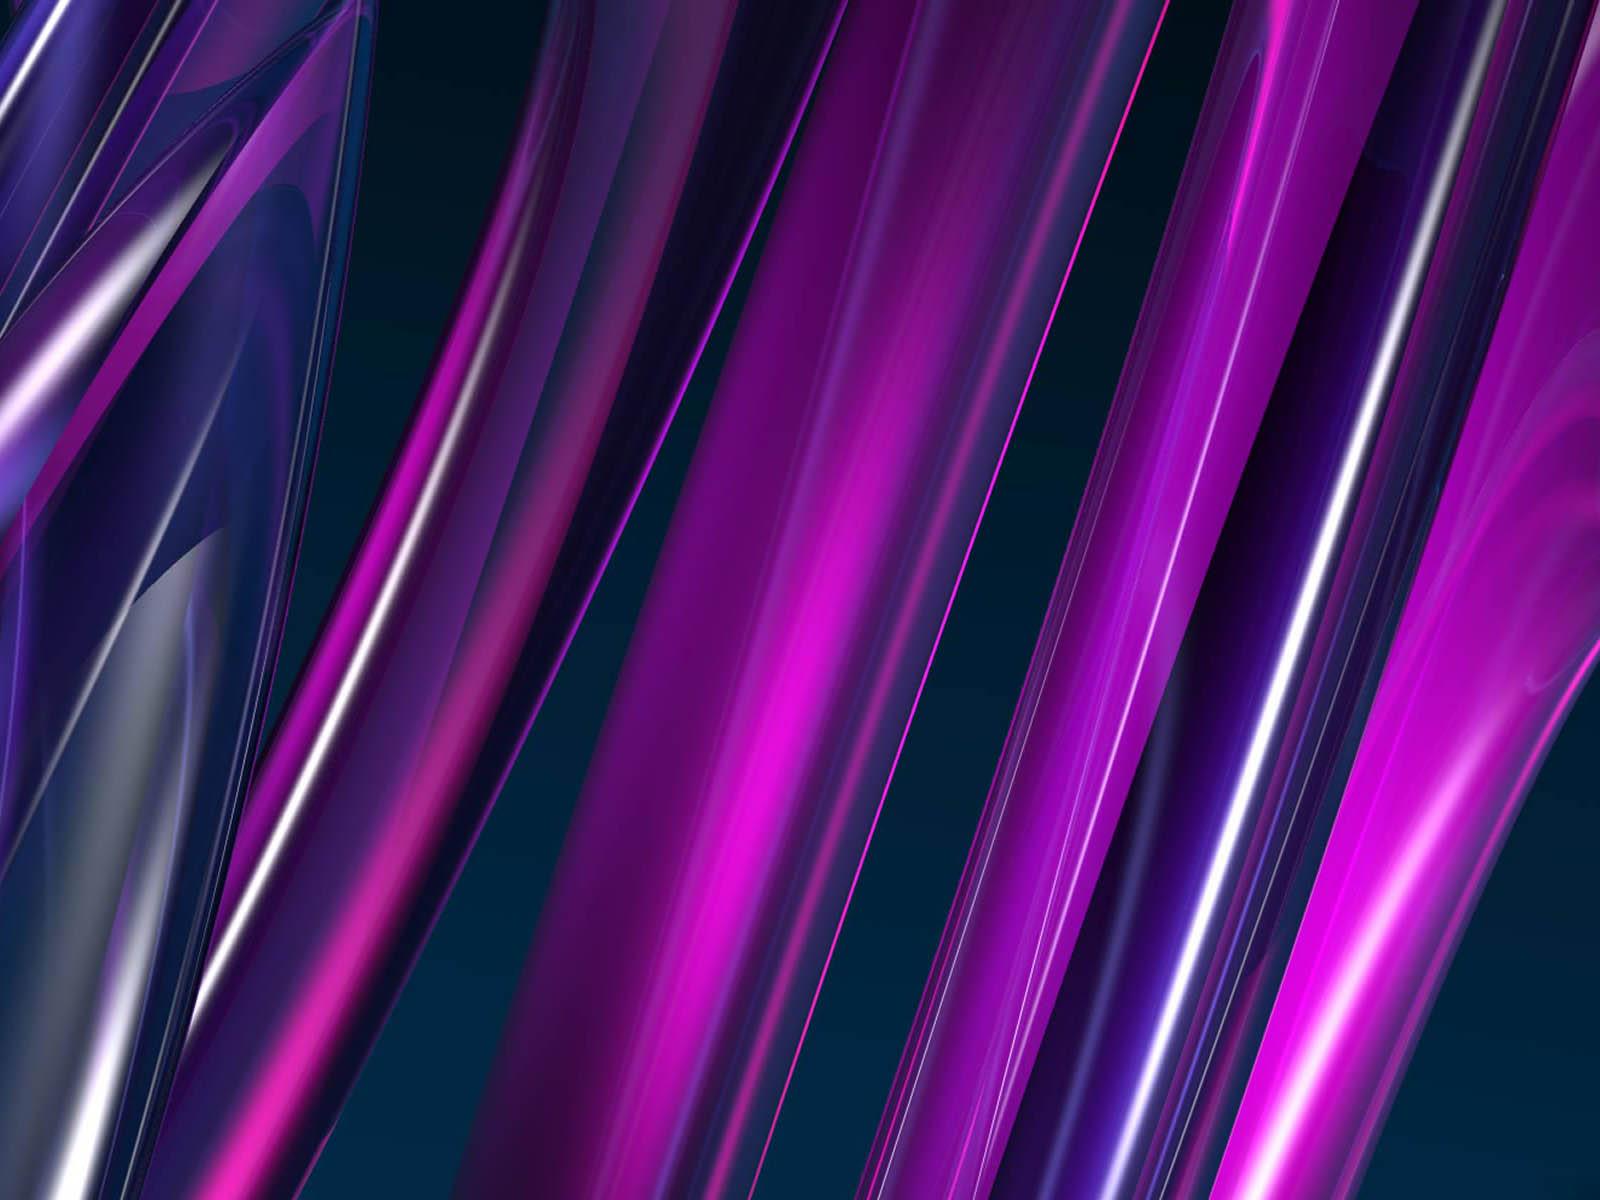 wallpaper purple abstract - photo #6